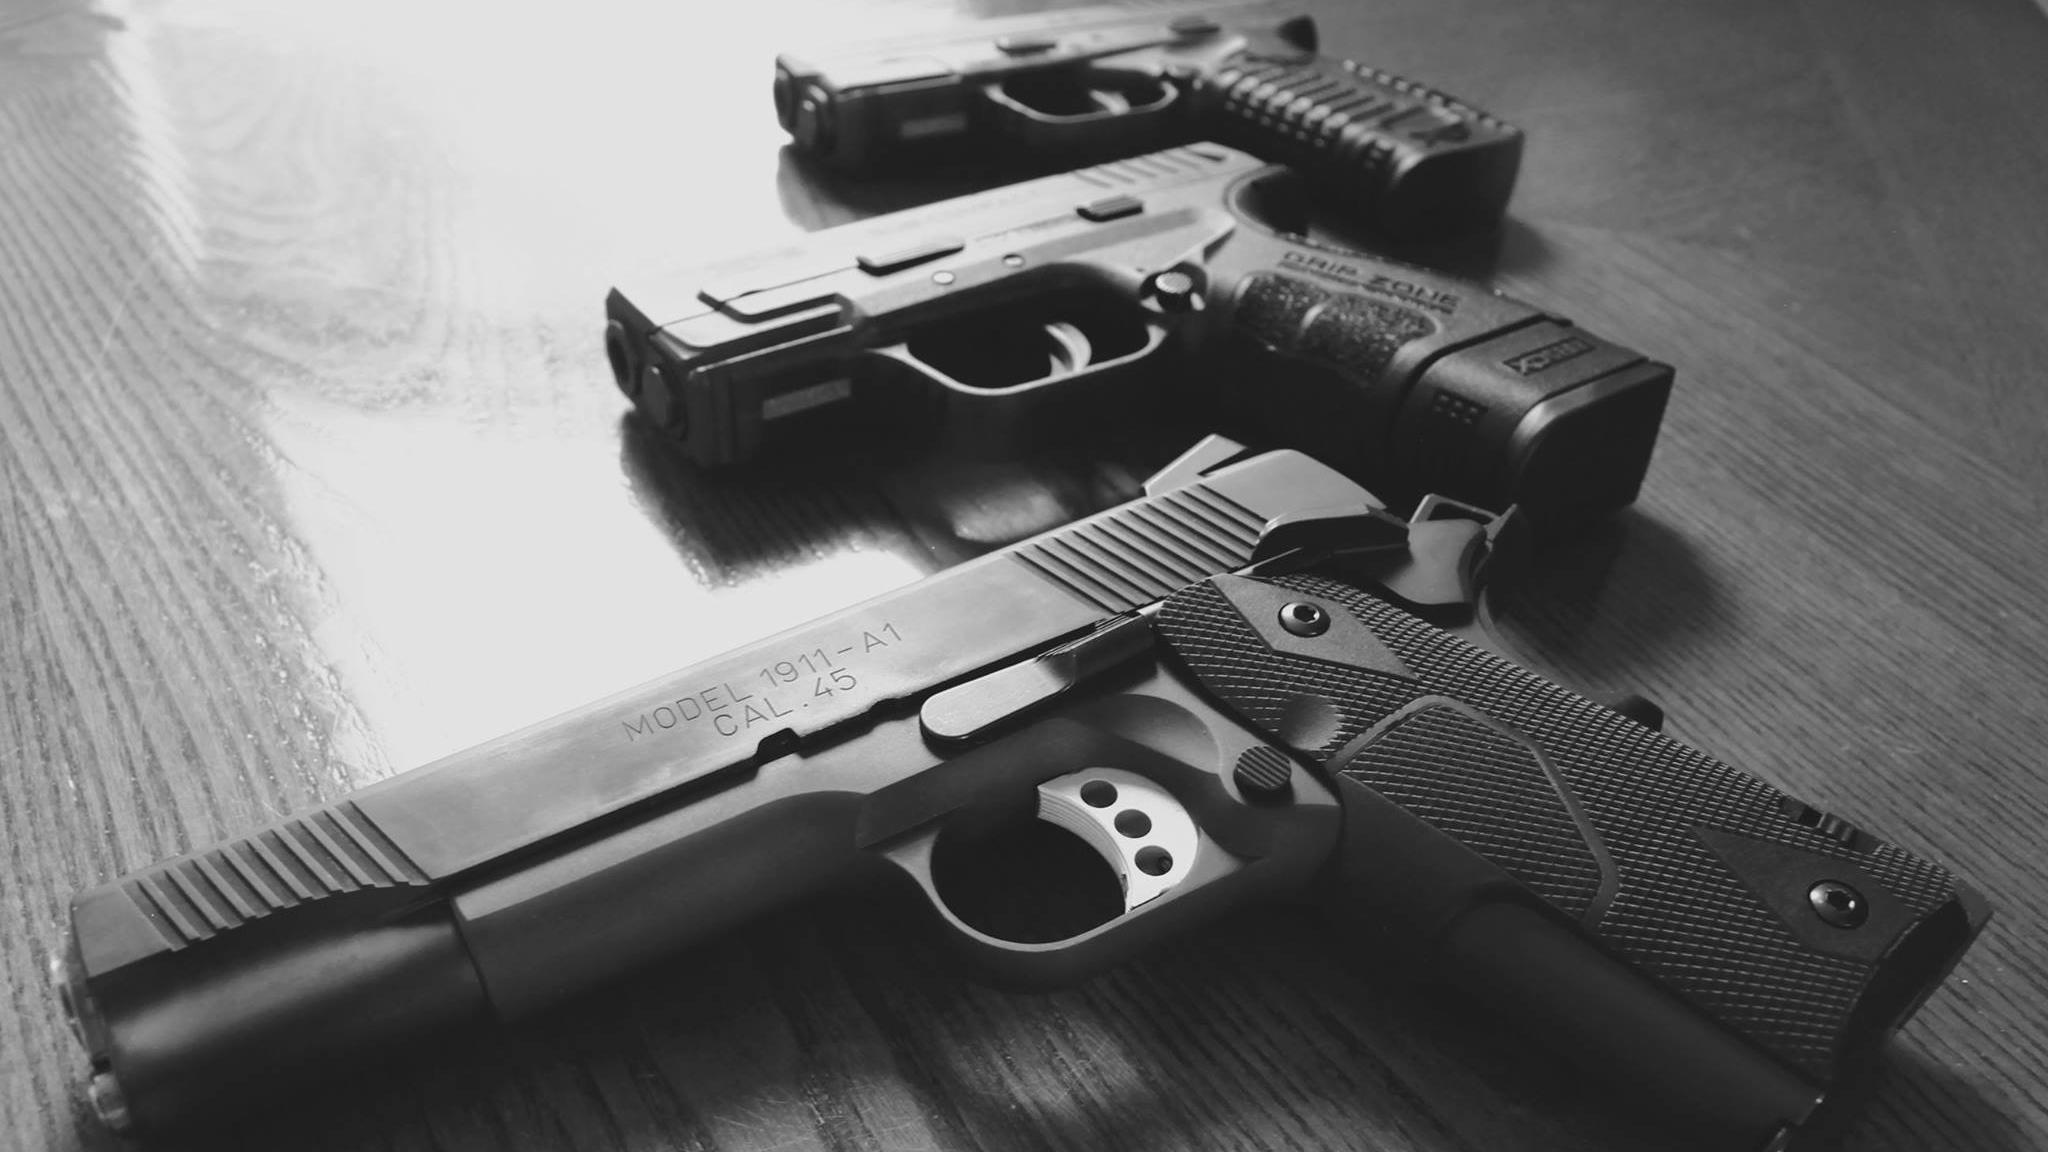 Gun Studies Permit Laws Reduce Murders Red Flag Laws Cut